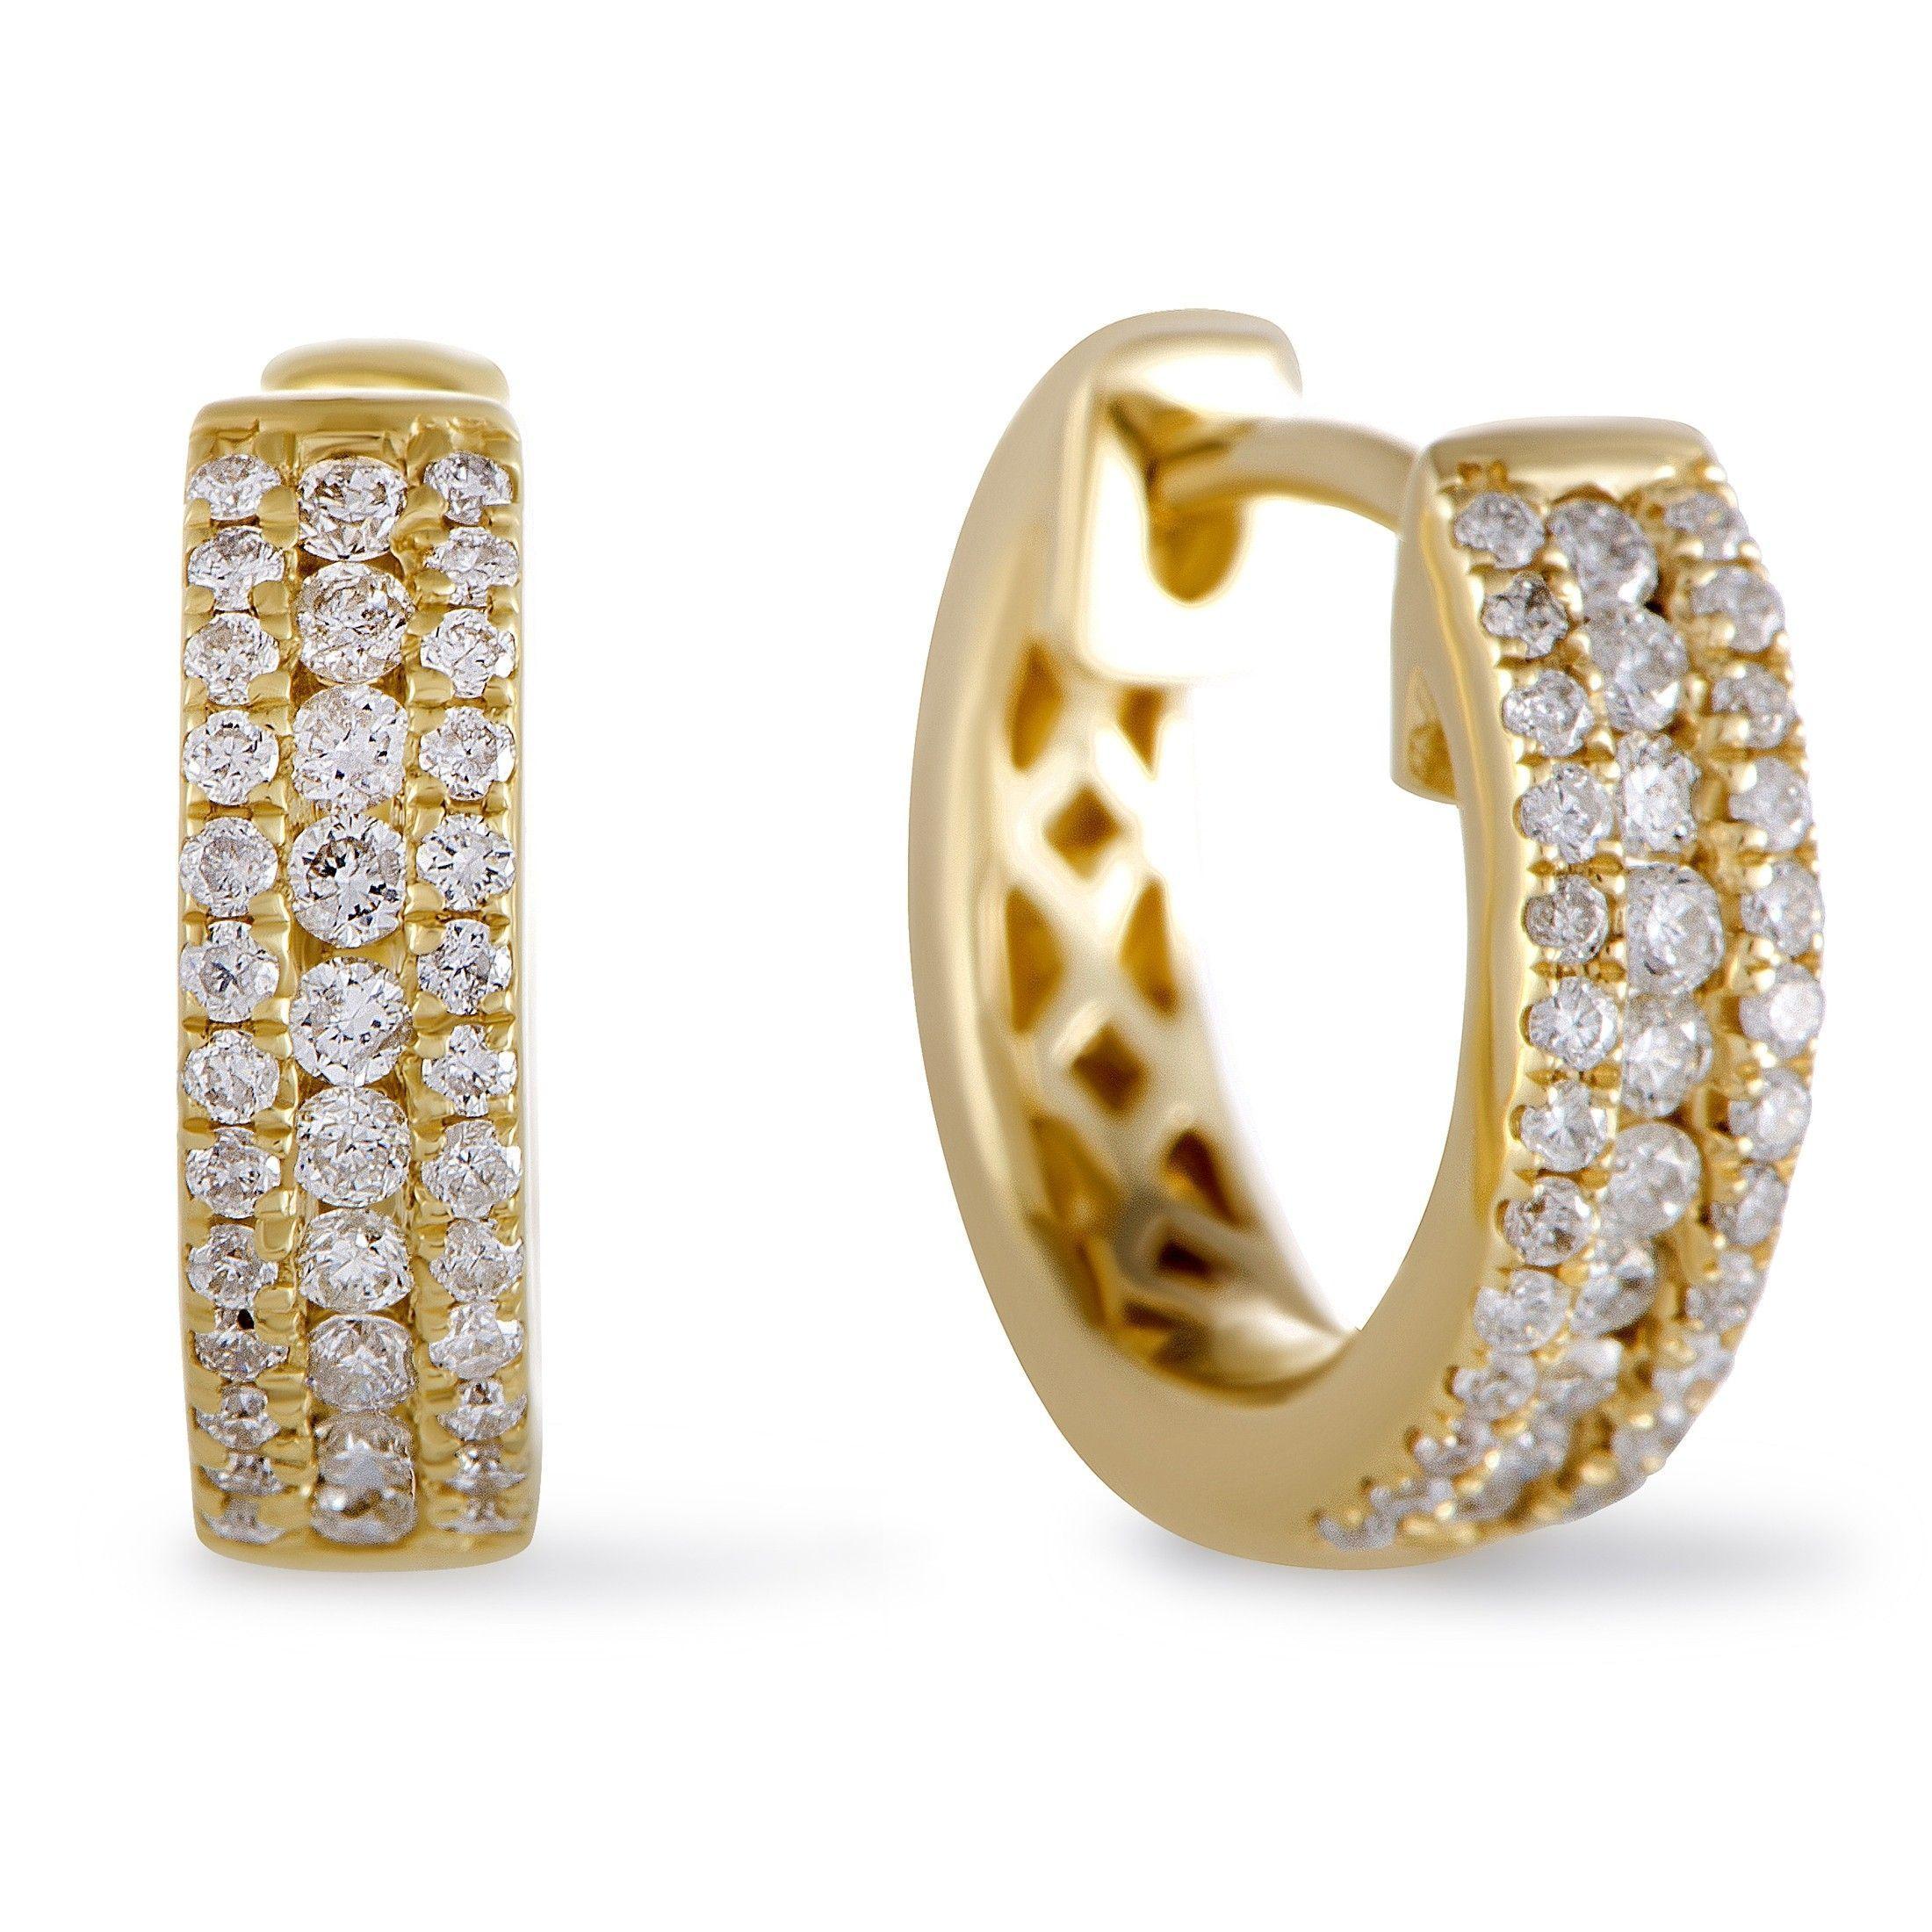 fc140c2fb ~.35ct Small 14K Yellow Gold Diamond Hoop Earrings | Luxury Bazaar |  www.luxurybazaar.com